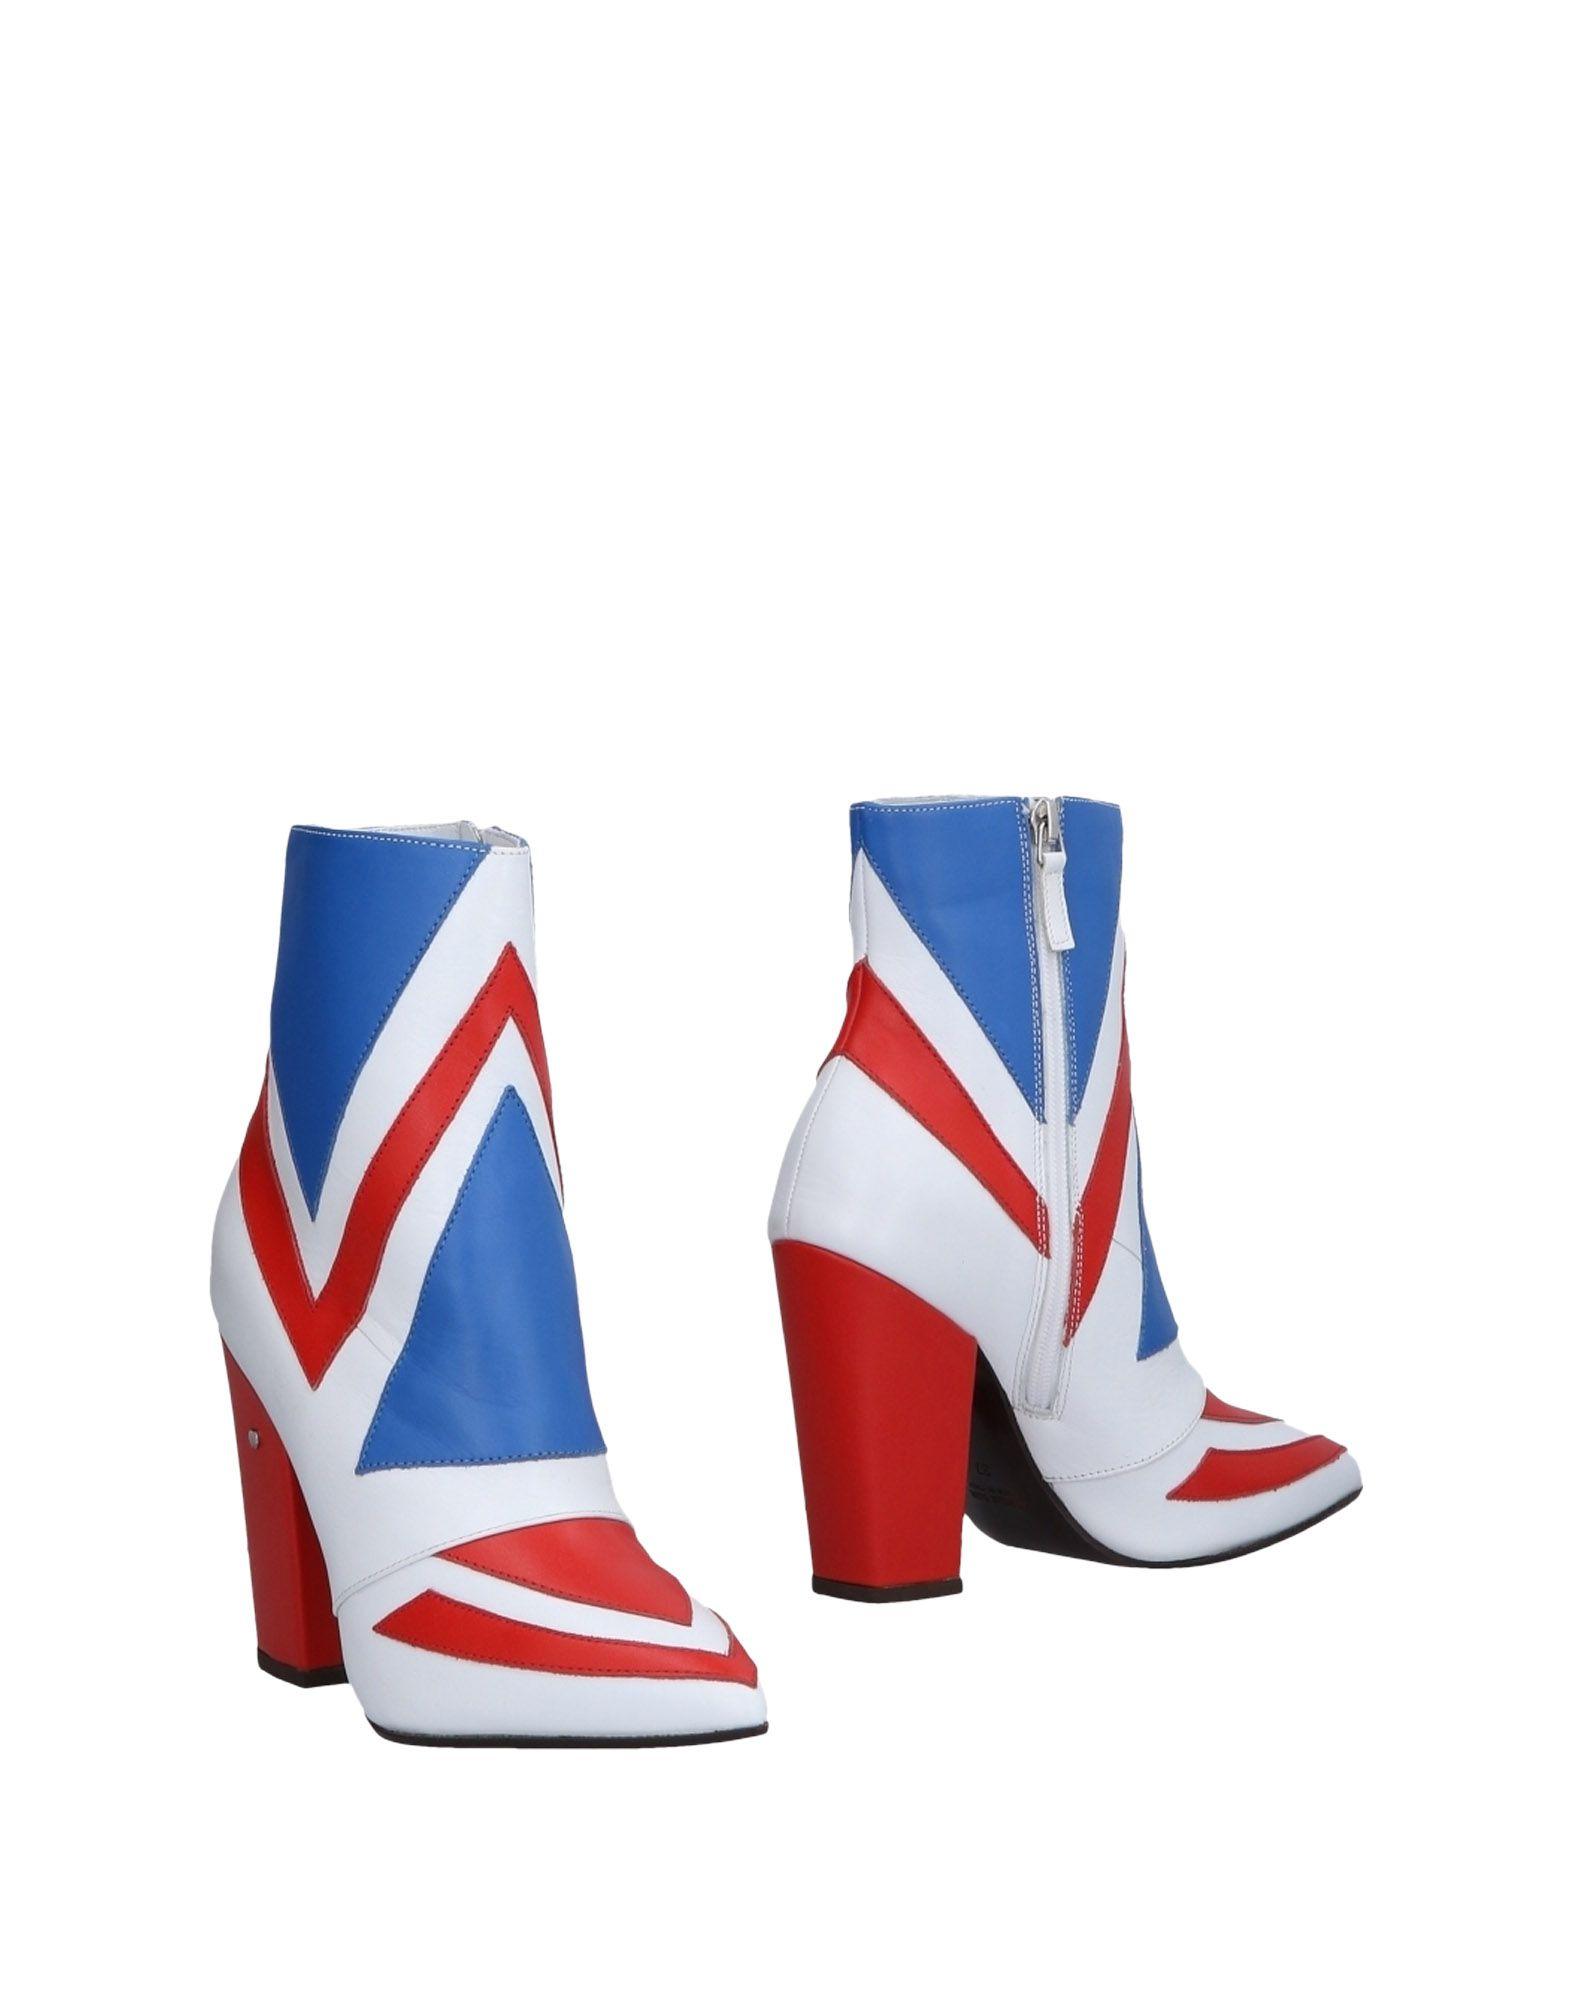 Bottine Laurence Dacade Femme - Bottines Laurence Dacade Rouge Chaussures femme pas cher homme et femme